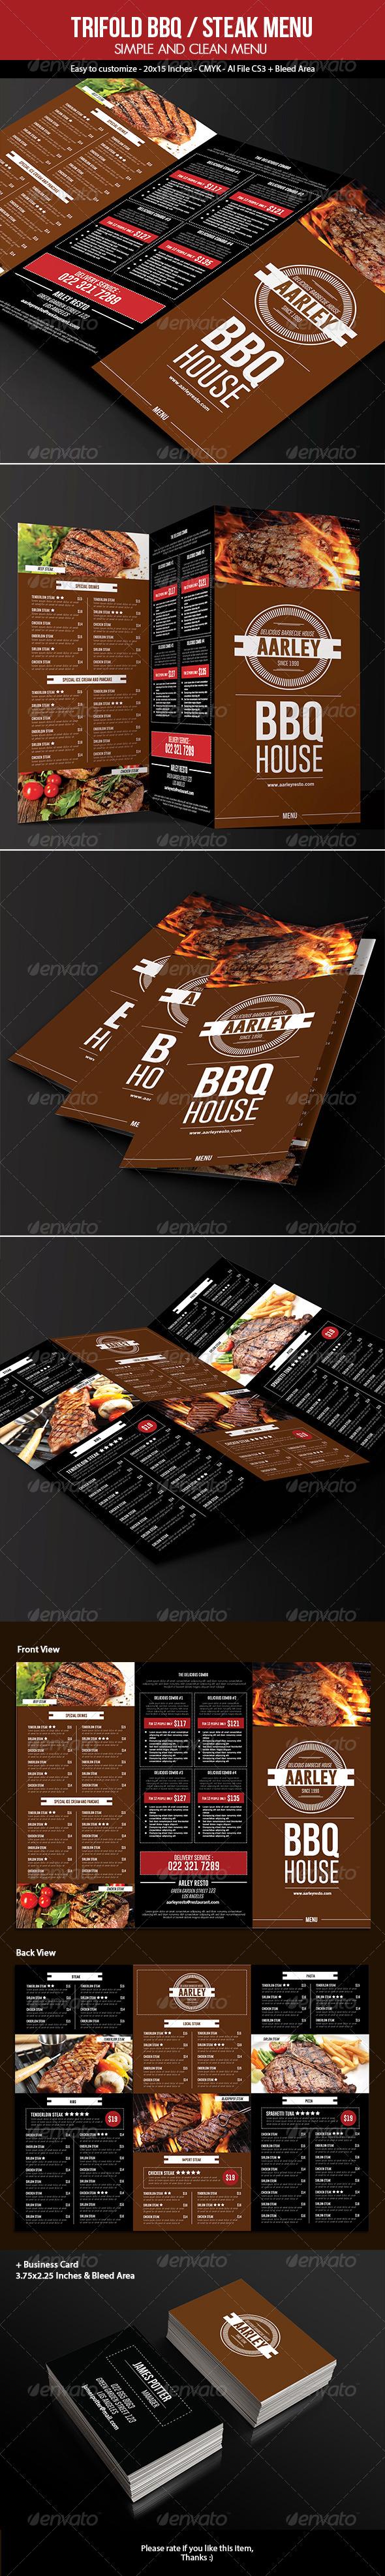 GraphicRiver Trifold BBQ Steak Menu & Business Card 7193576